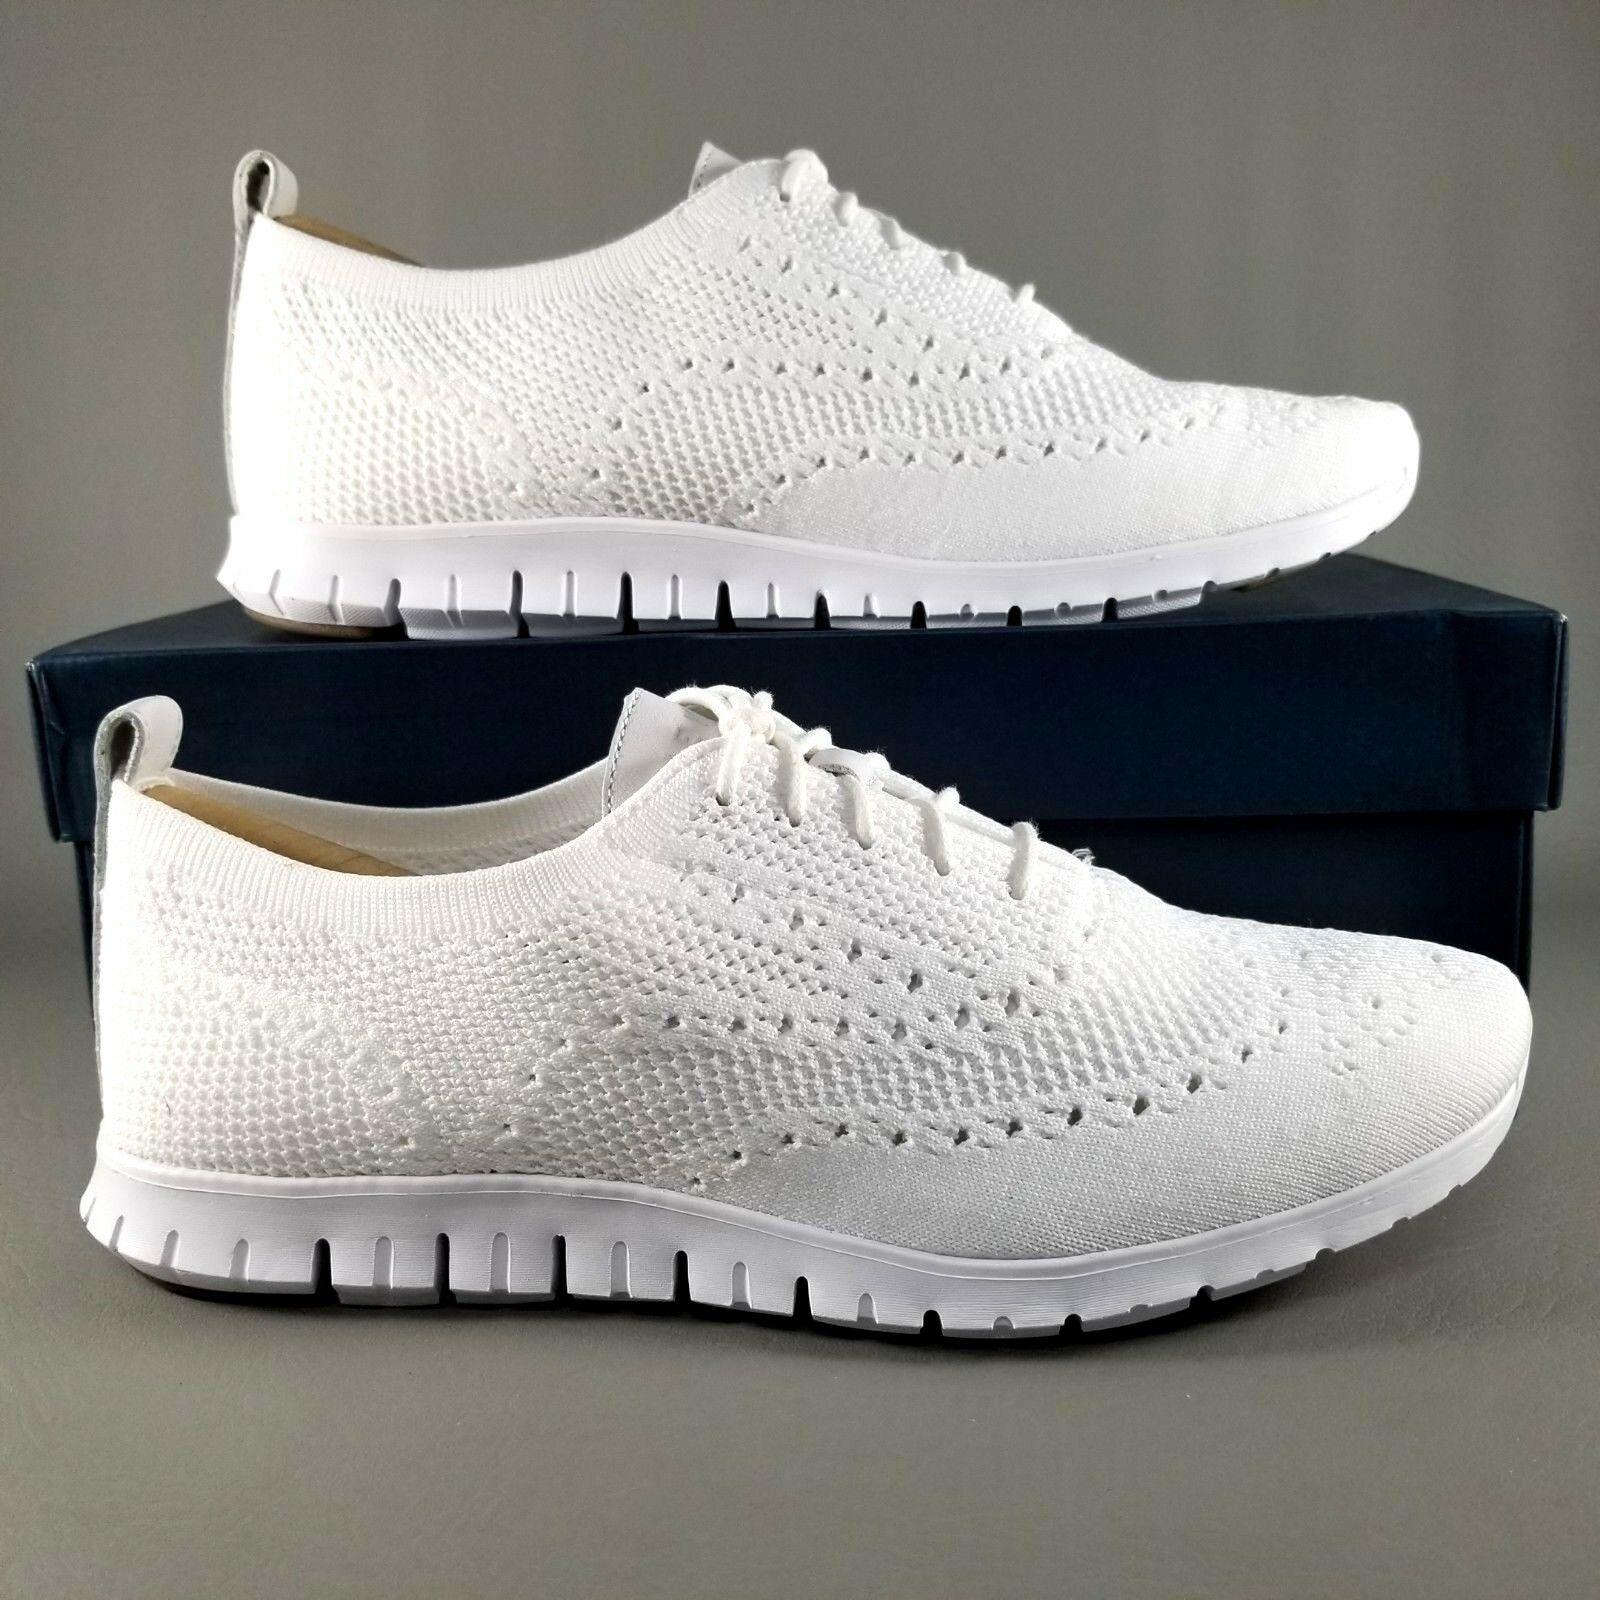 Cole Haan ZeroGrand Stitchlite Wingtip Oxfords SZ 9.5 B Womens Dress Shoes White